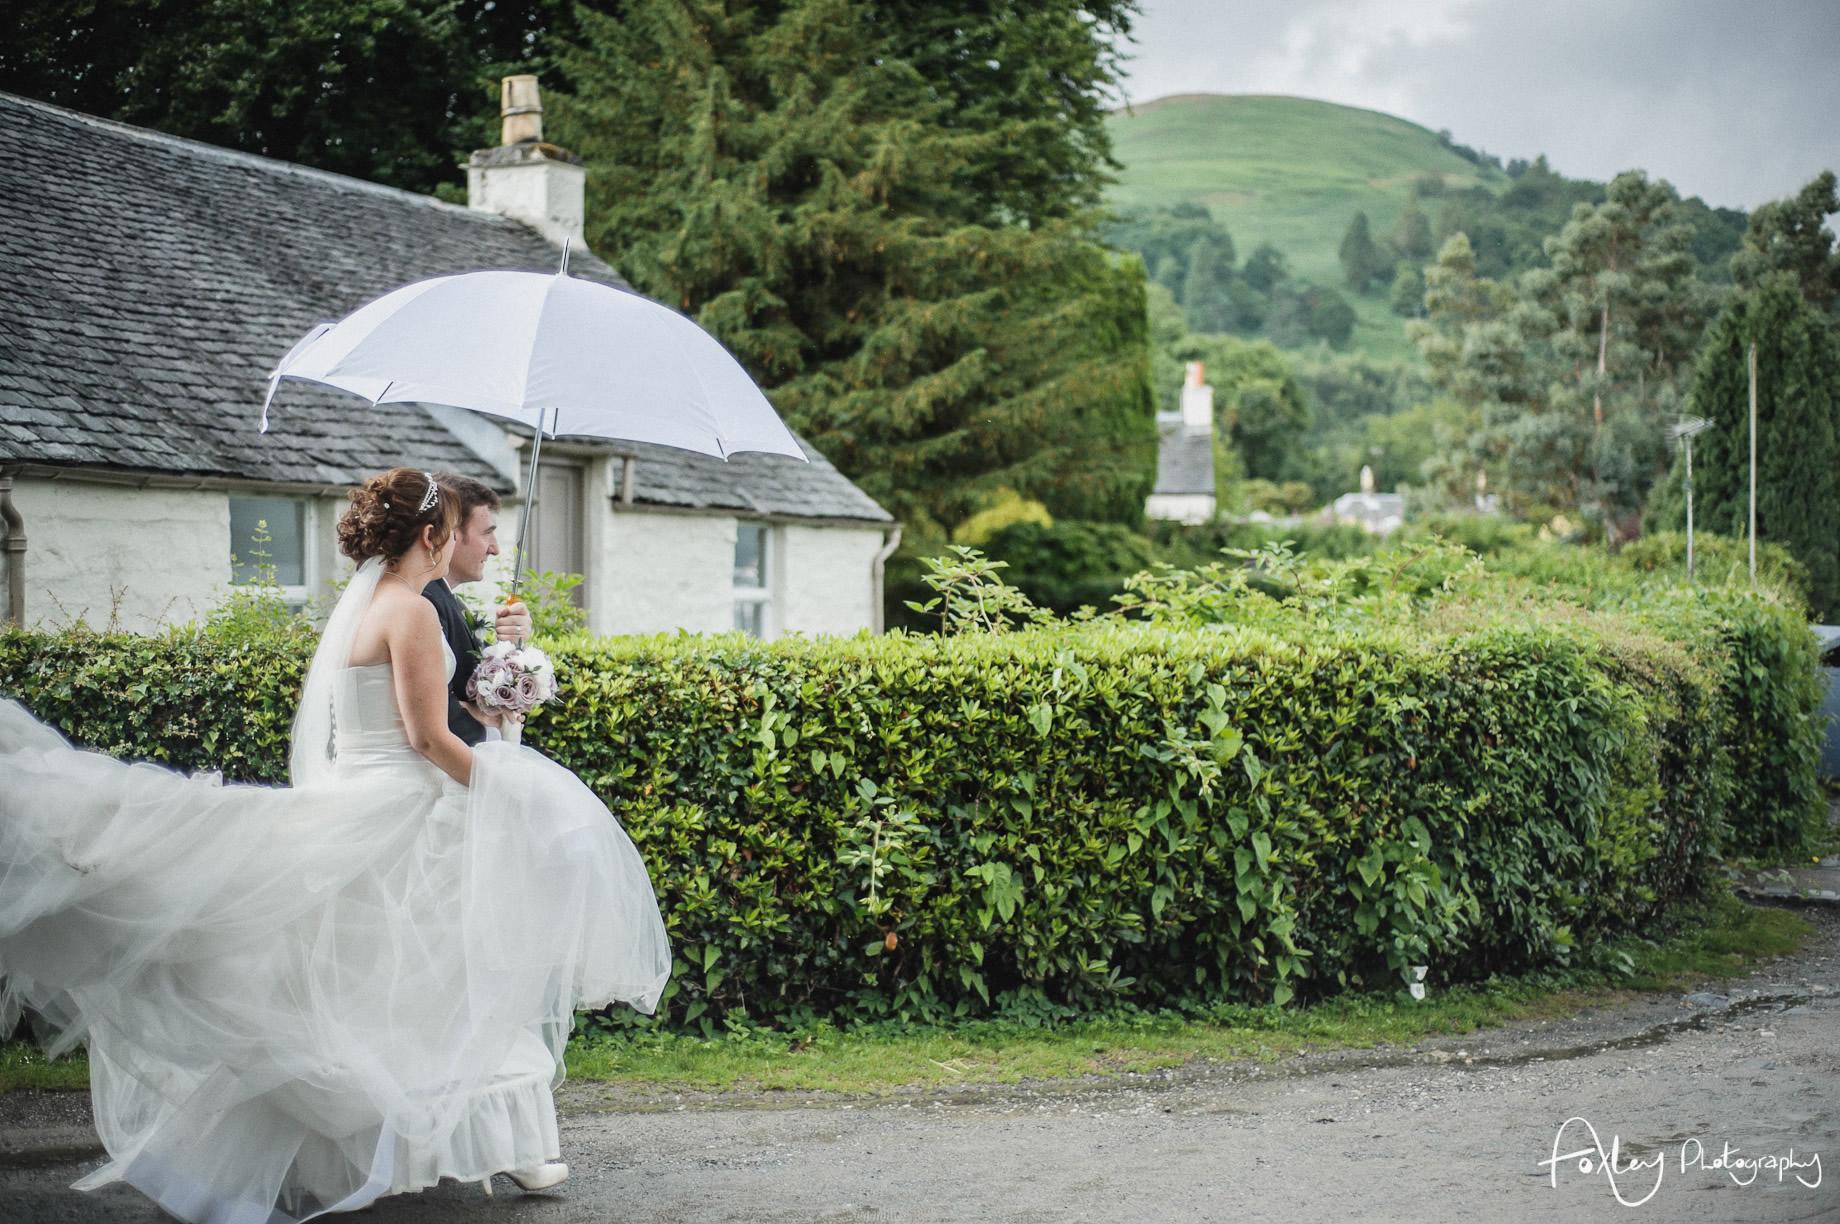 Alys-And-Davids-Wedding-Loch-Lomond-105